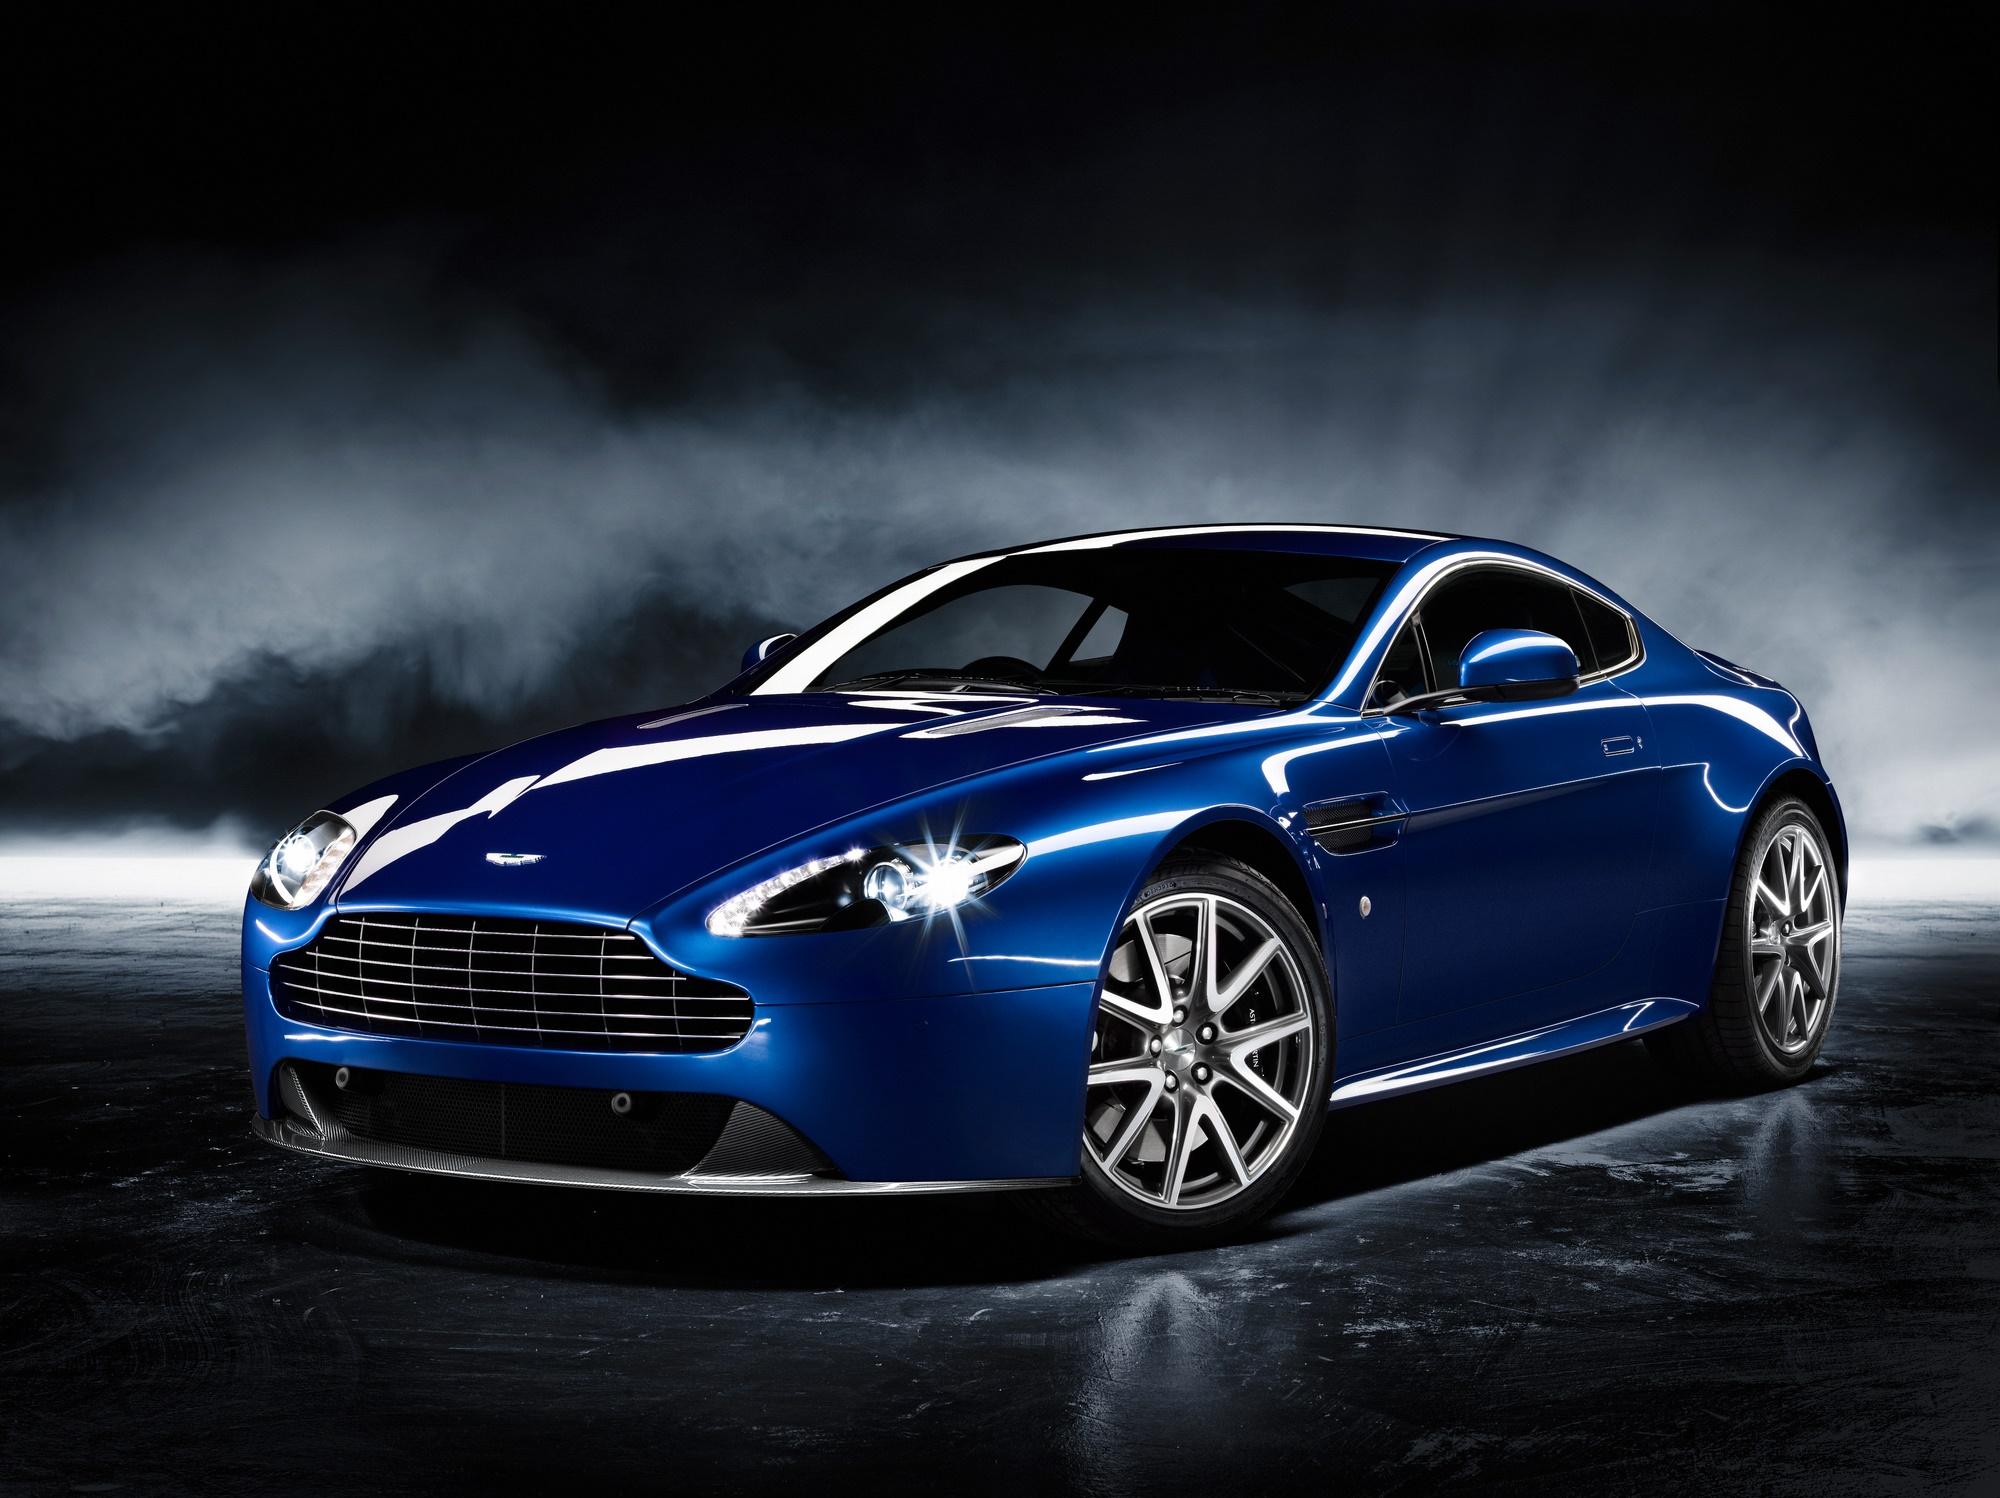 Aston Martin  New Aston Martin cars for sale  Auto Trader UK